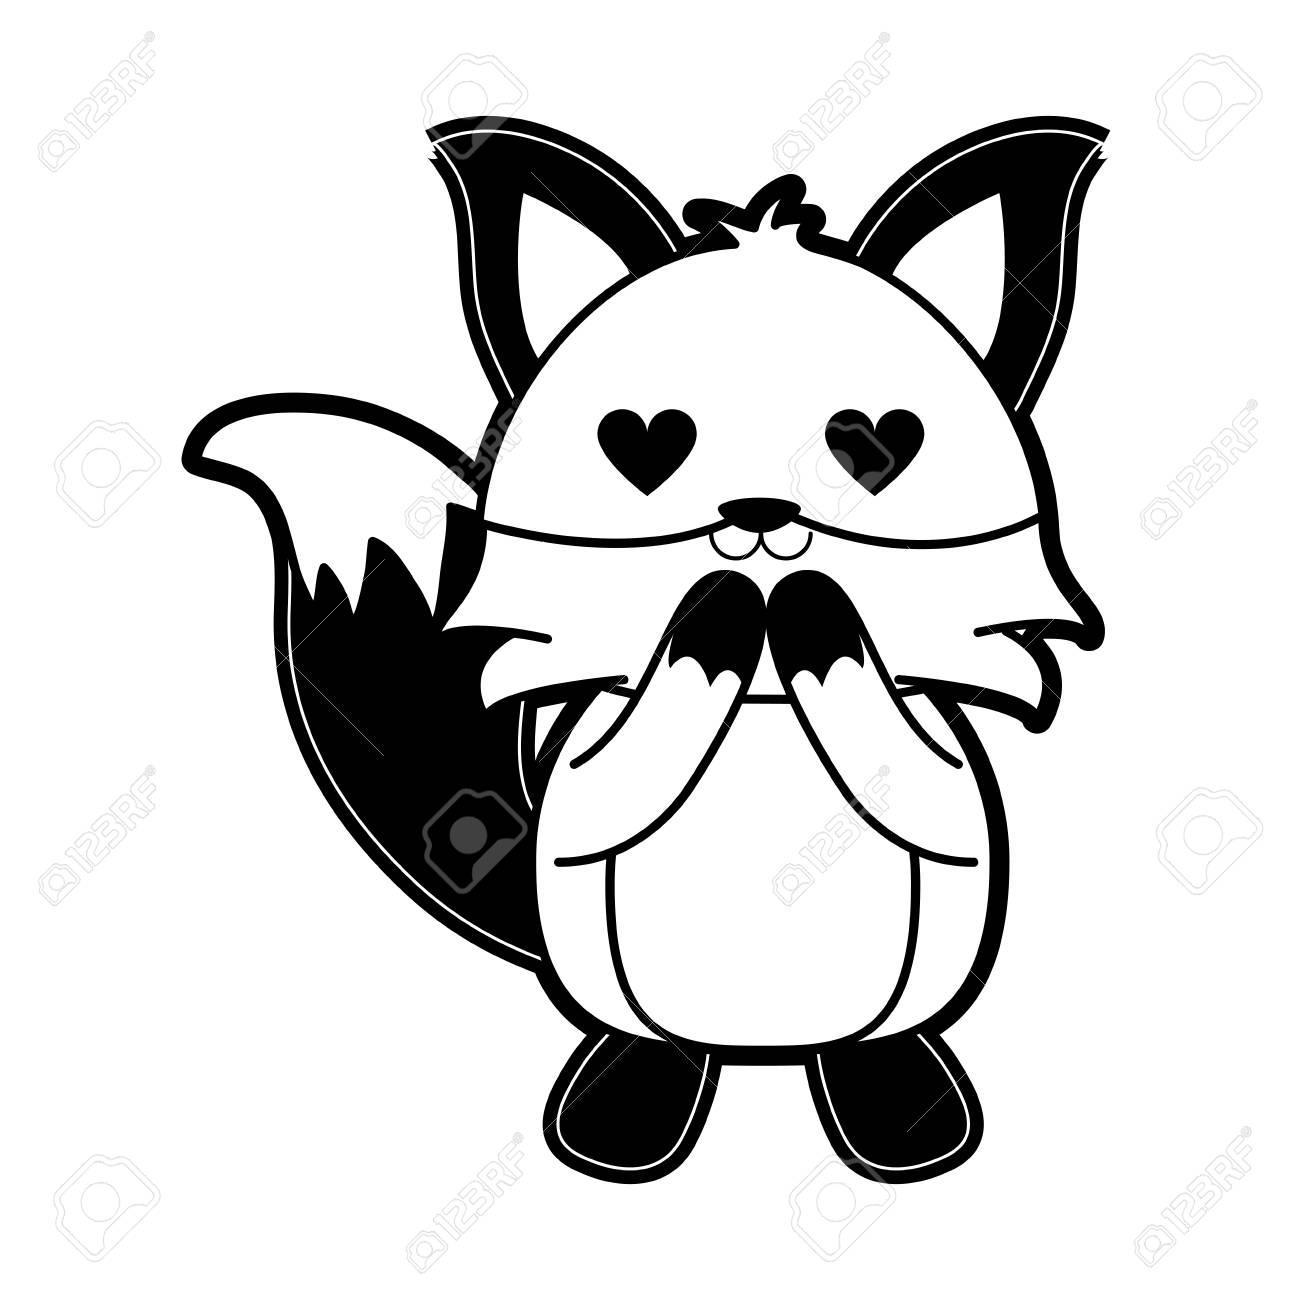 Renard Avec Des Yeux De Coeur Mignon Dessin Anime Animal Icone